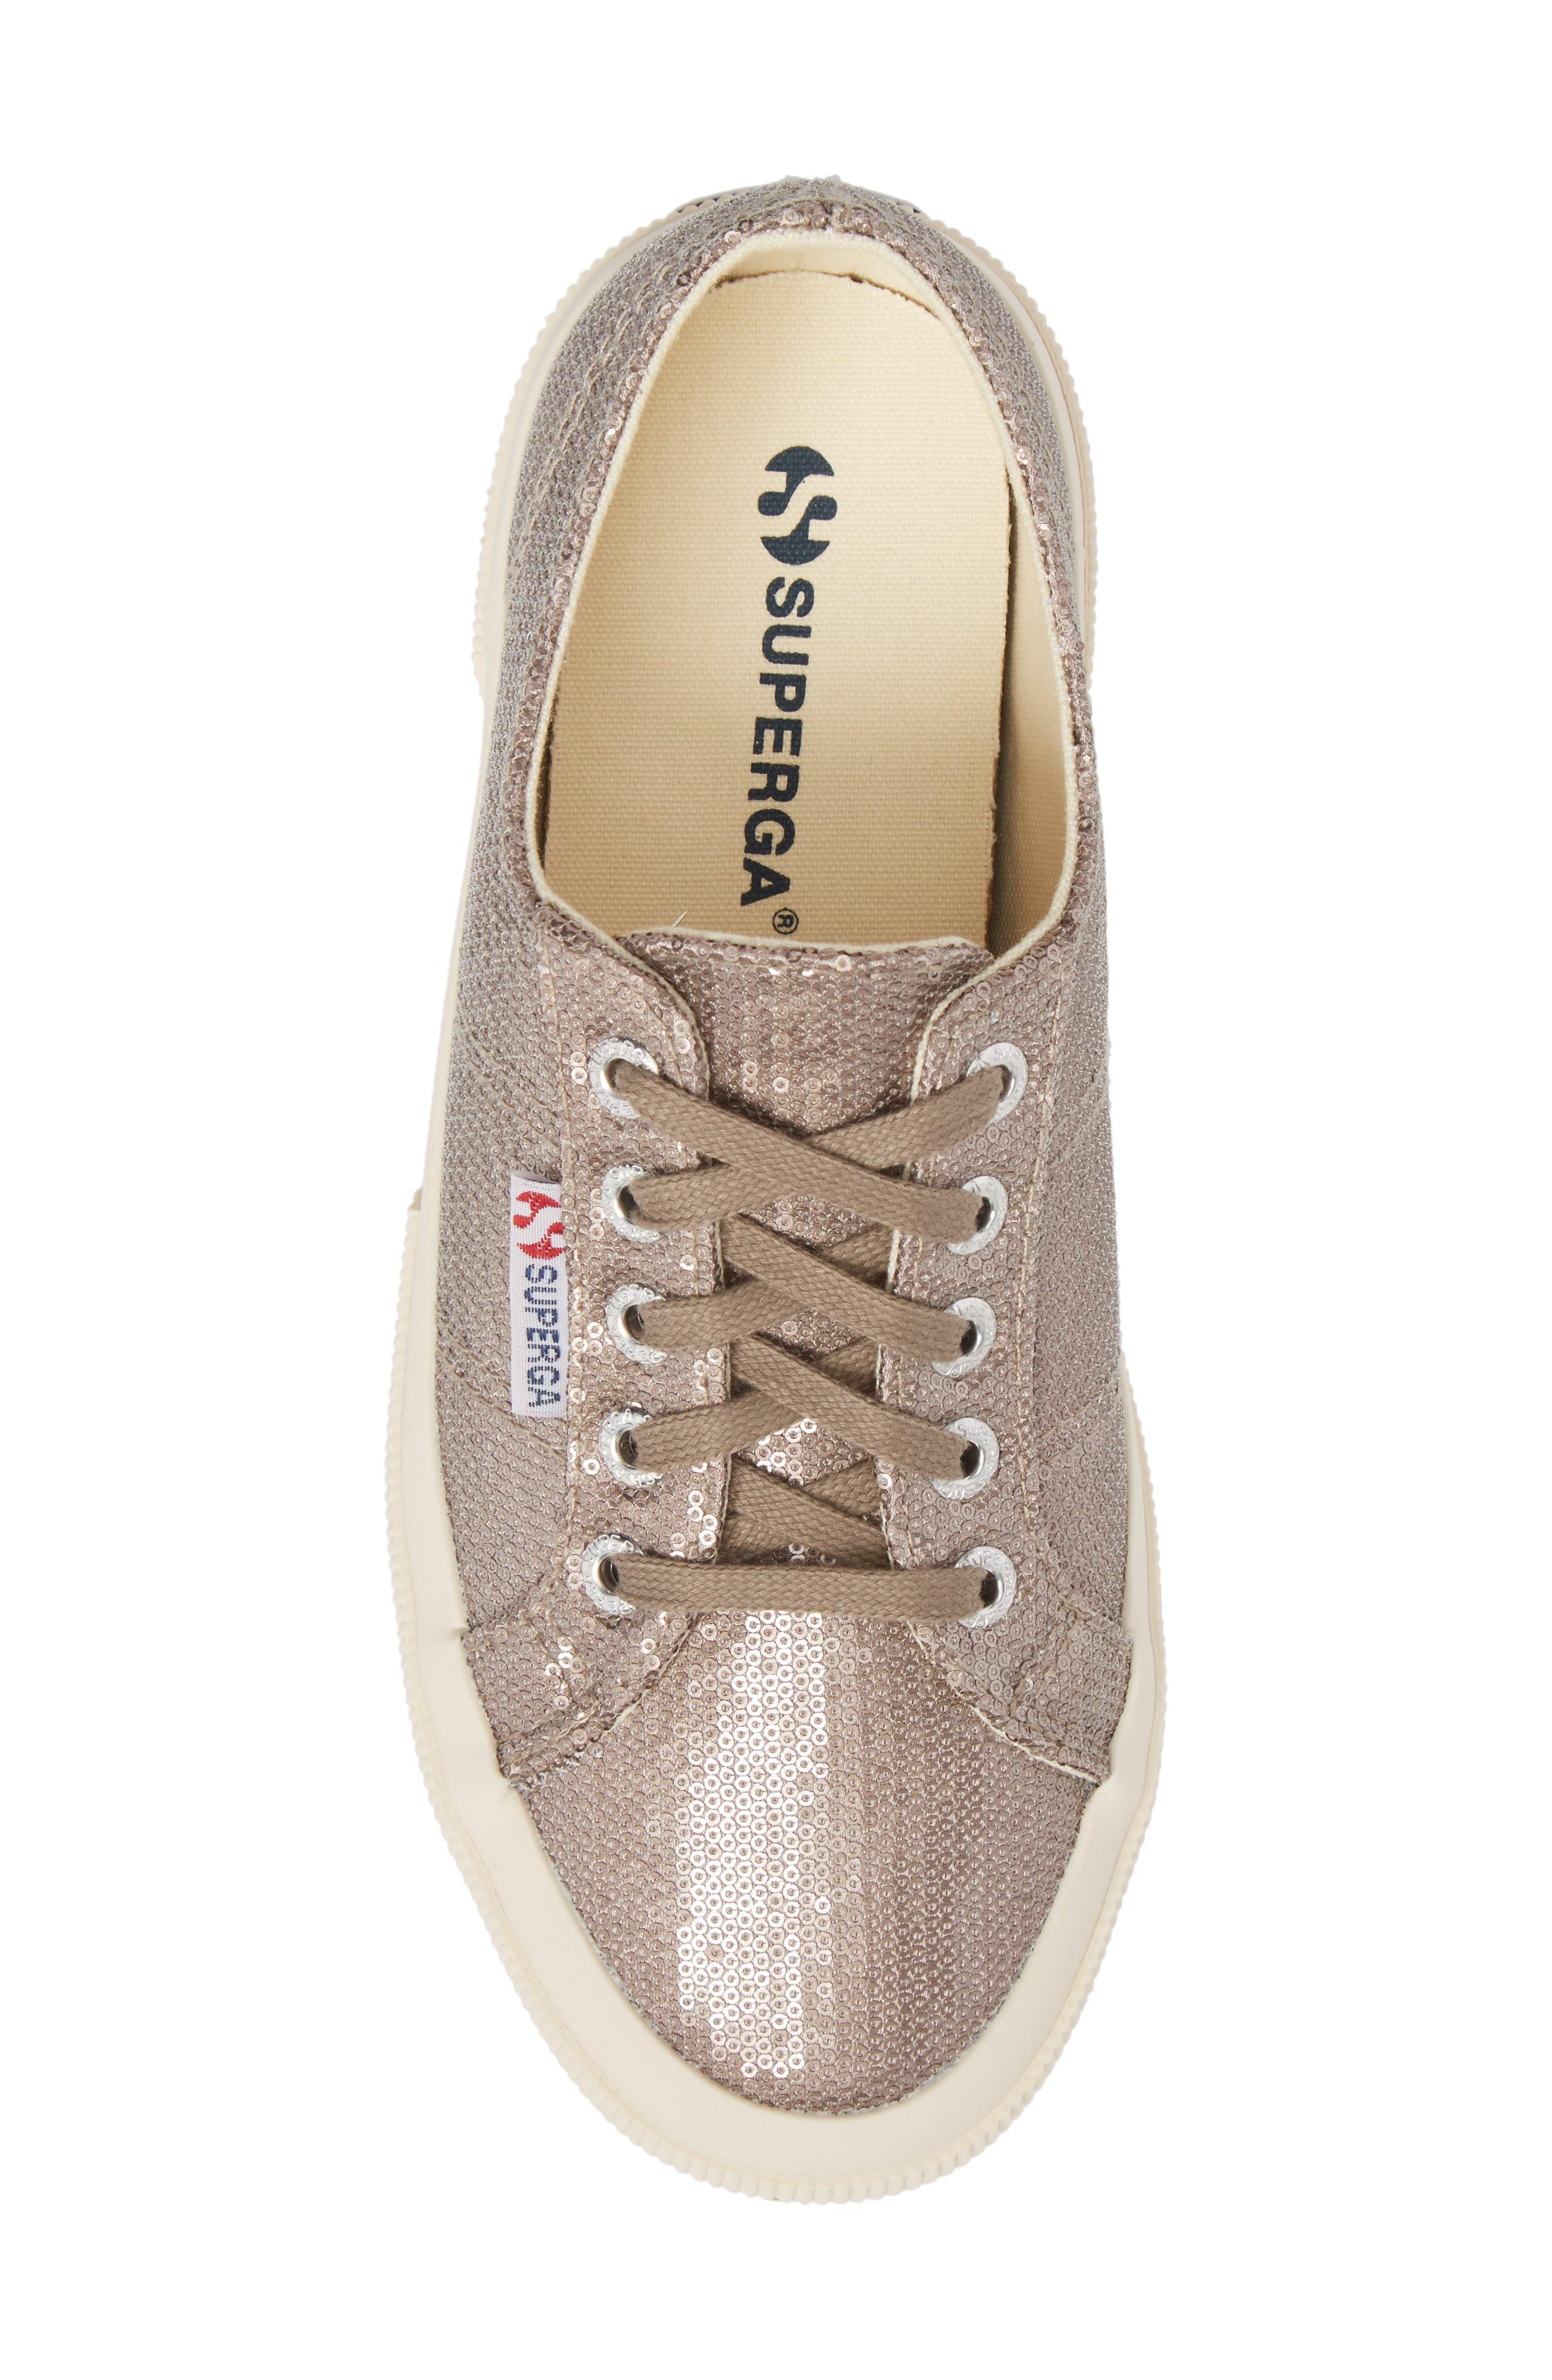 2750 Micro Sequin Sneaker,                             Alternate thumbnail 5, color,